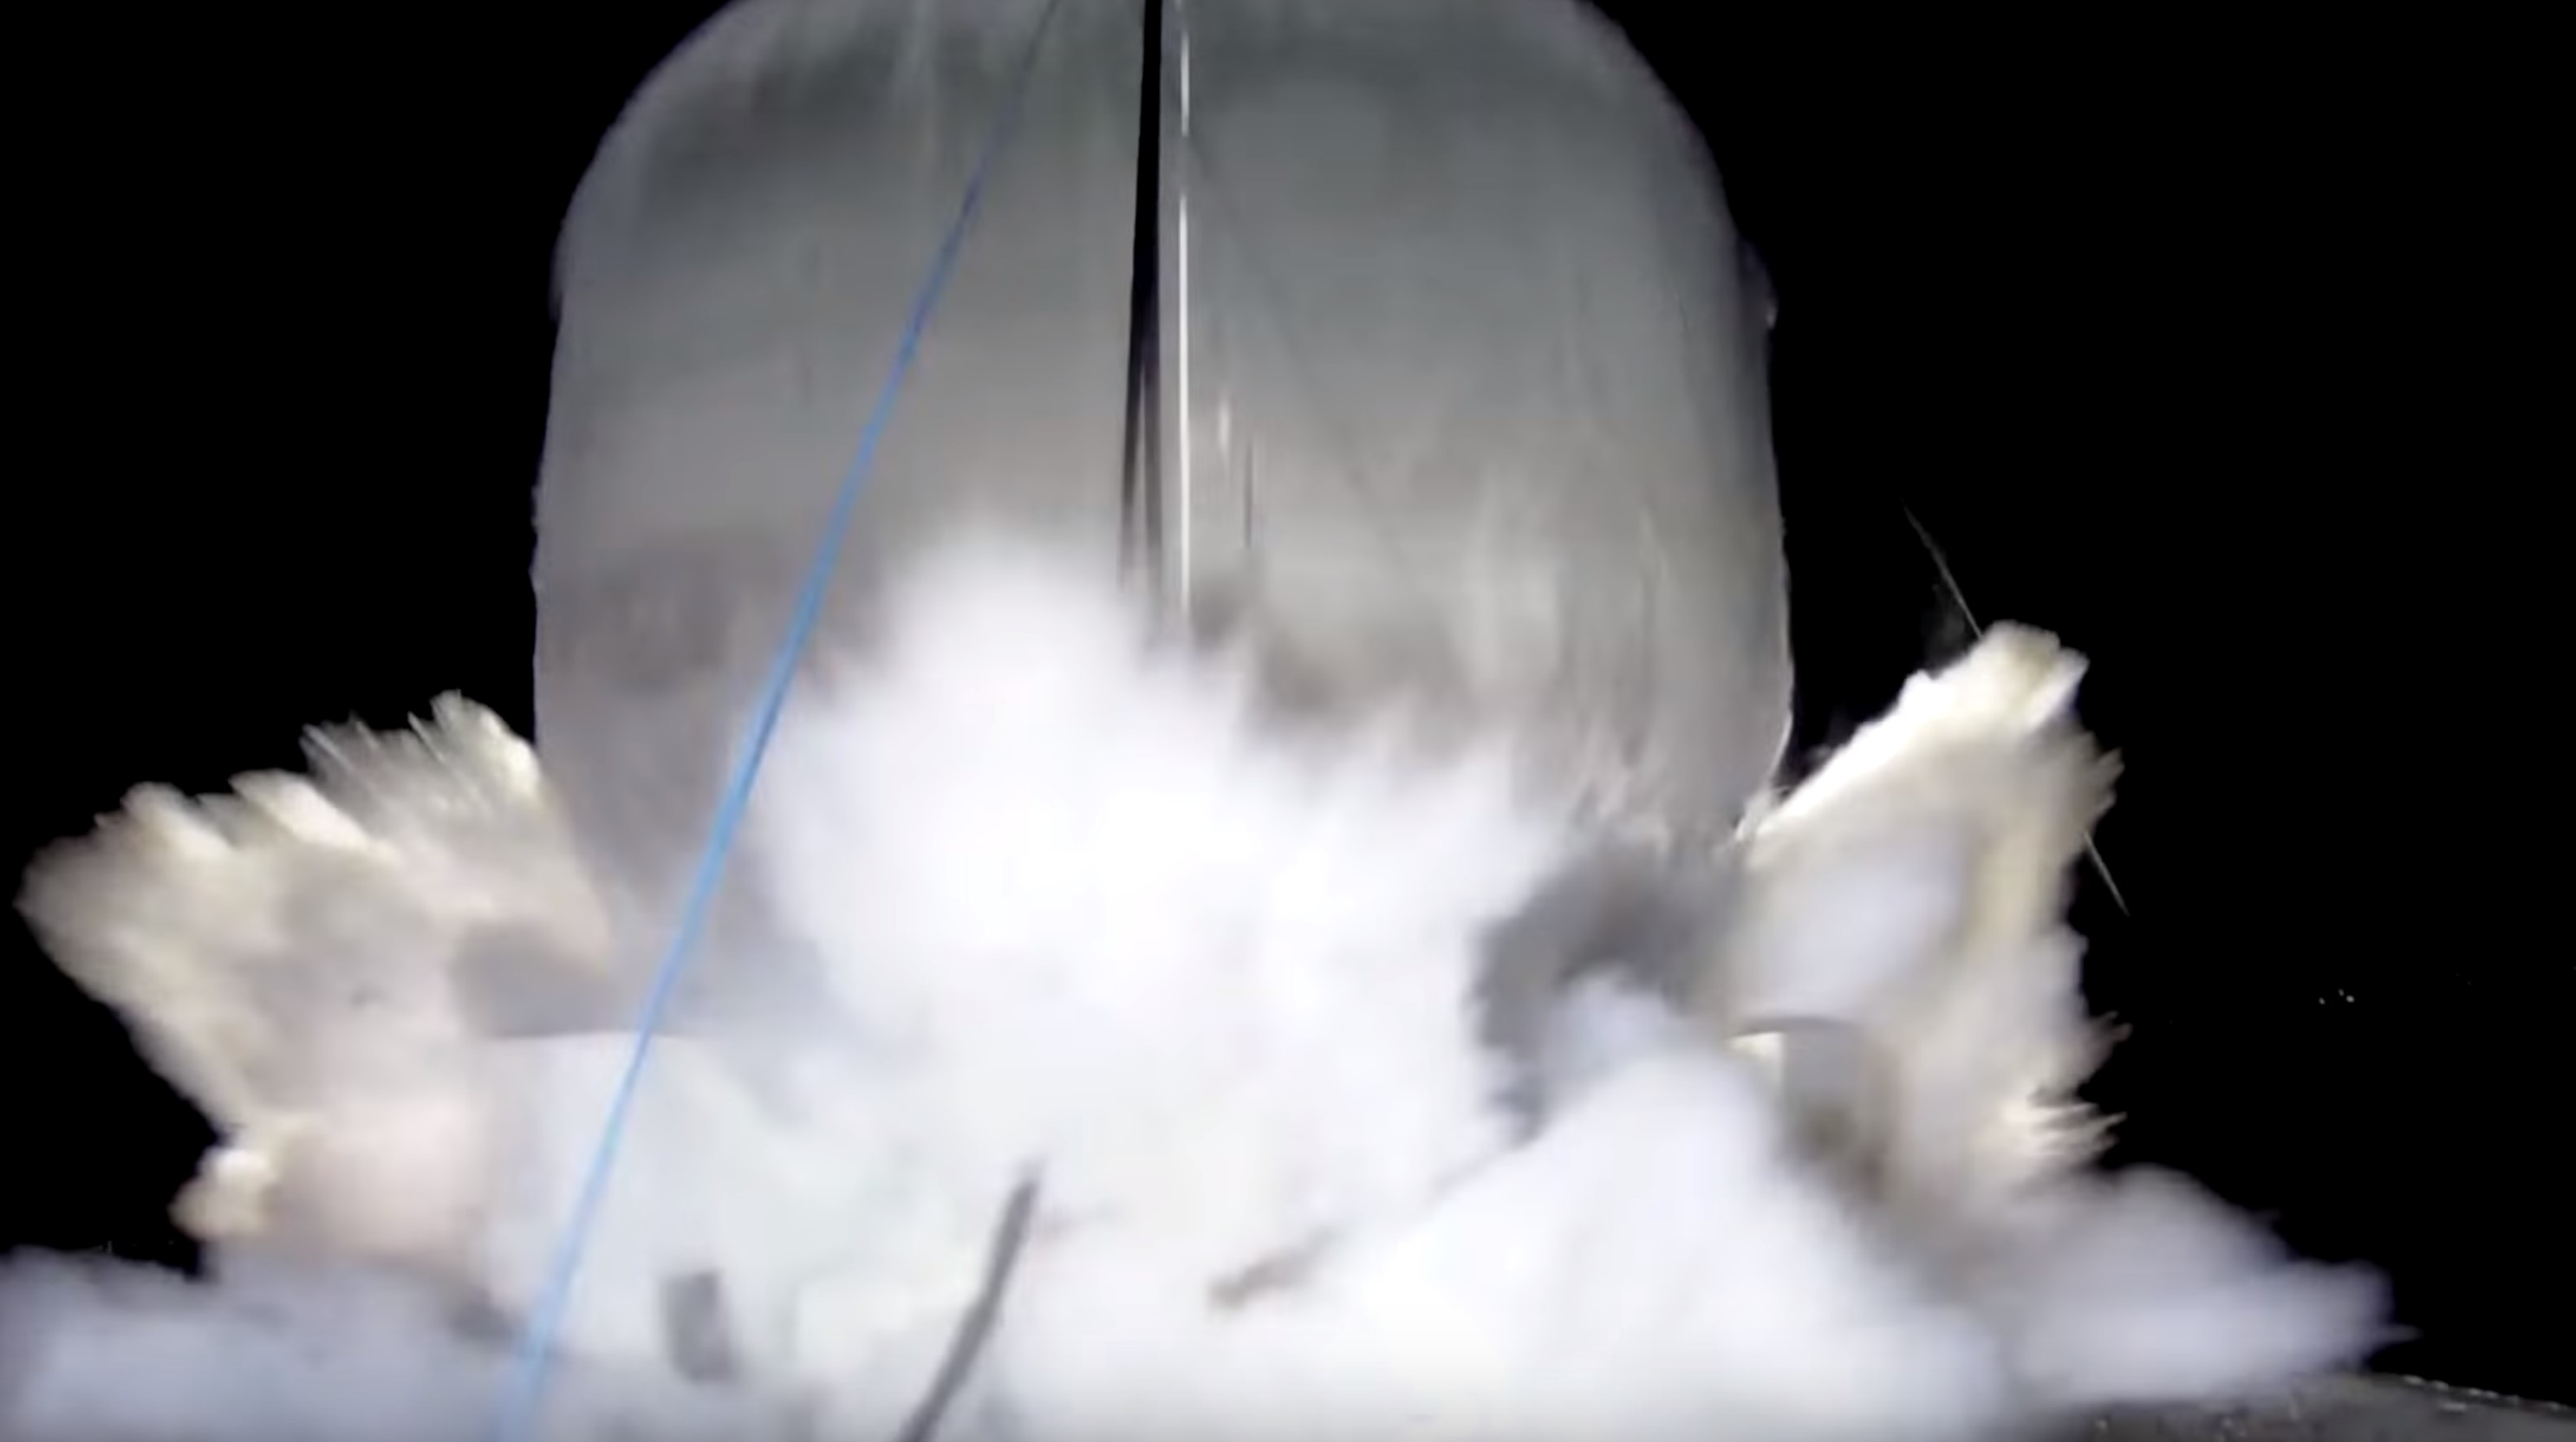 carbon fiber tank test 2 (SpaceX)